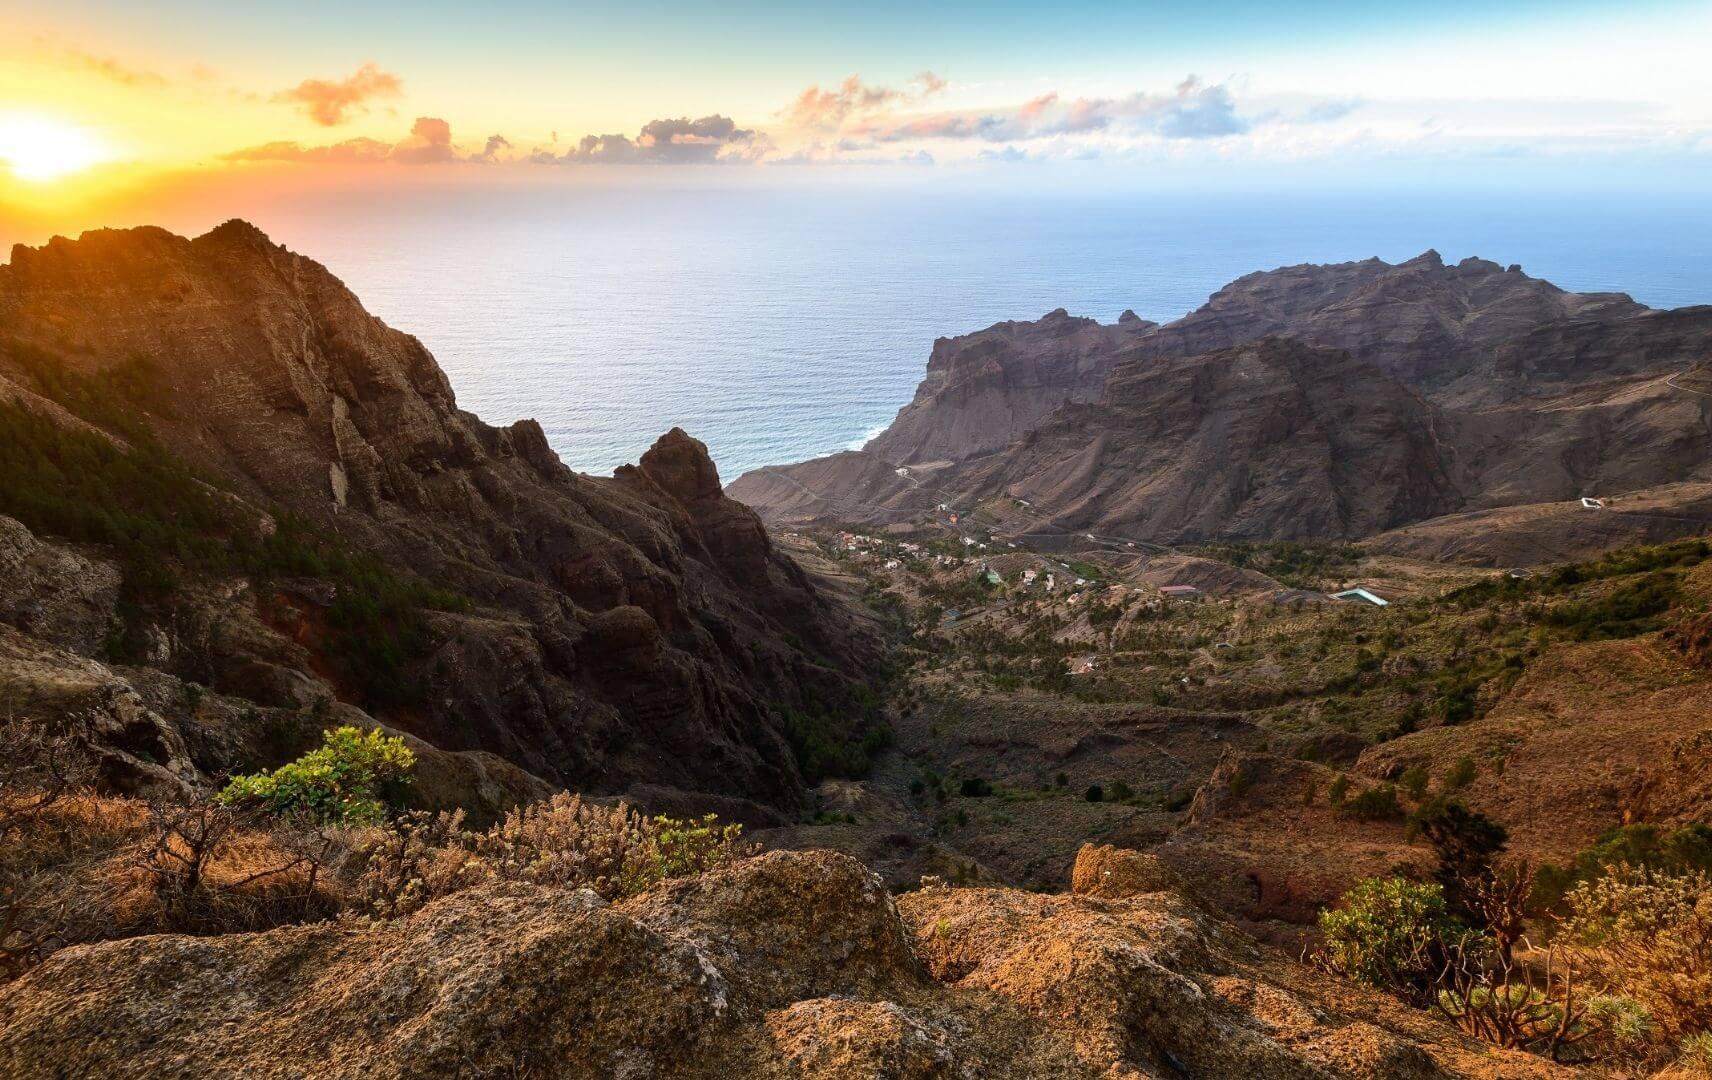 Gran Canaria Sonnenuntergang über Berglandschaft